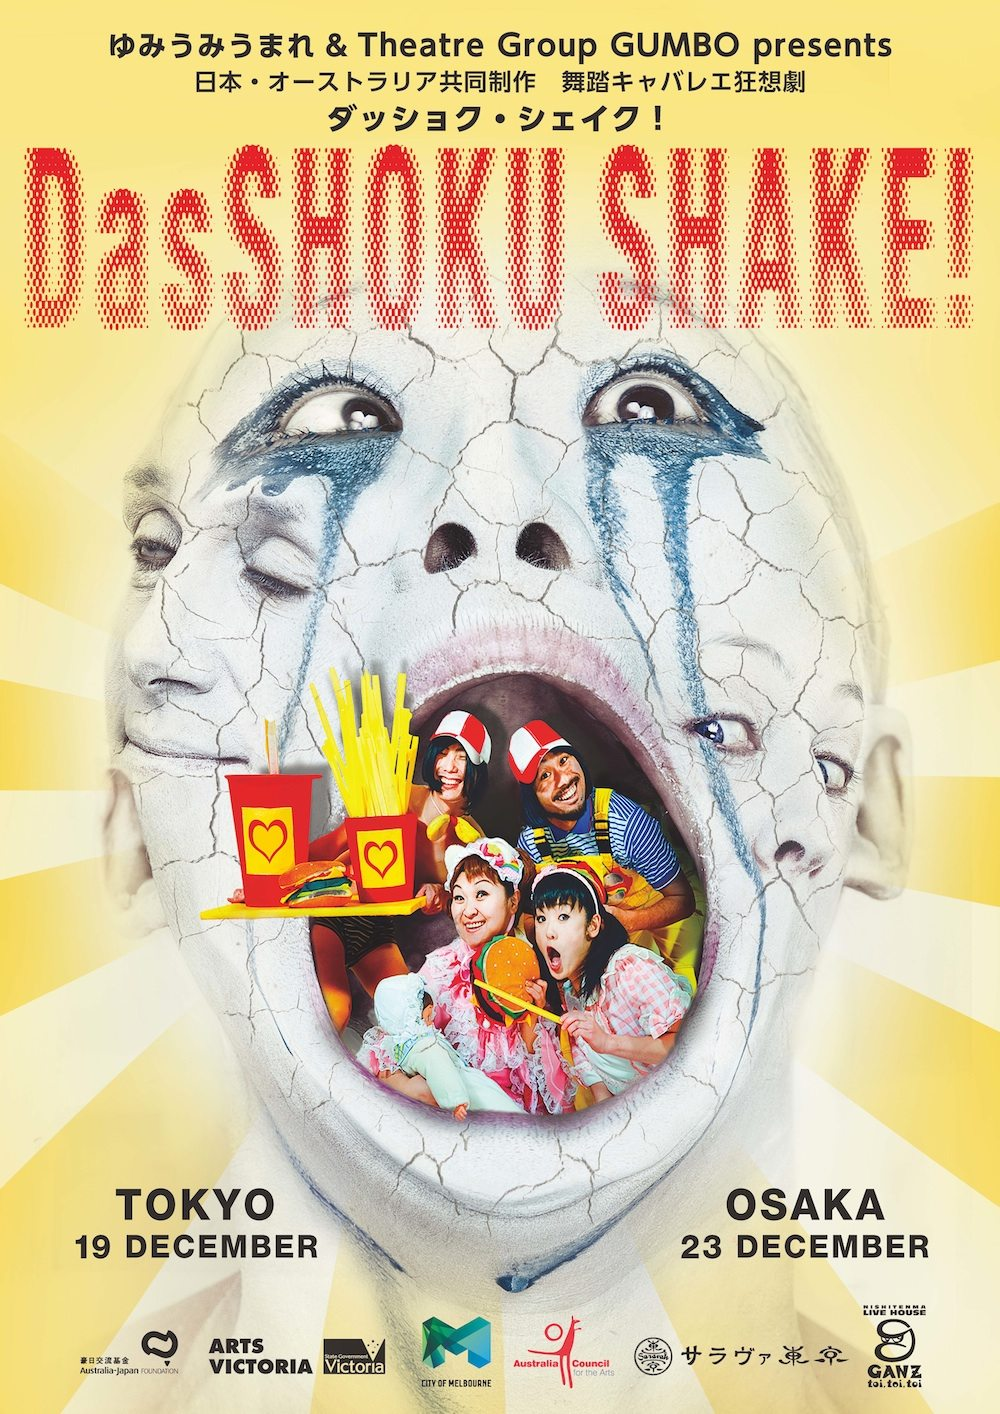 DasSHOKU_SHAKE_japan_2014_flyer01_01.jpg